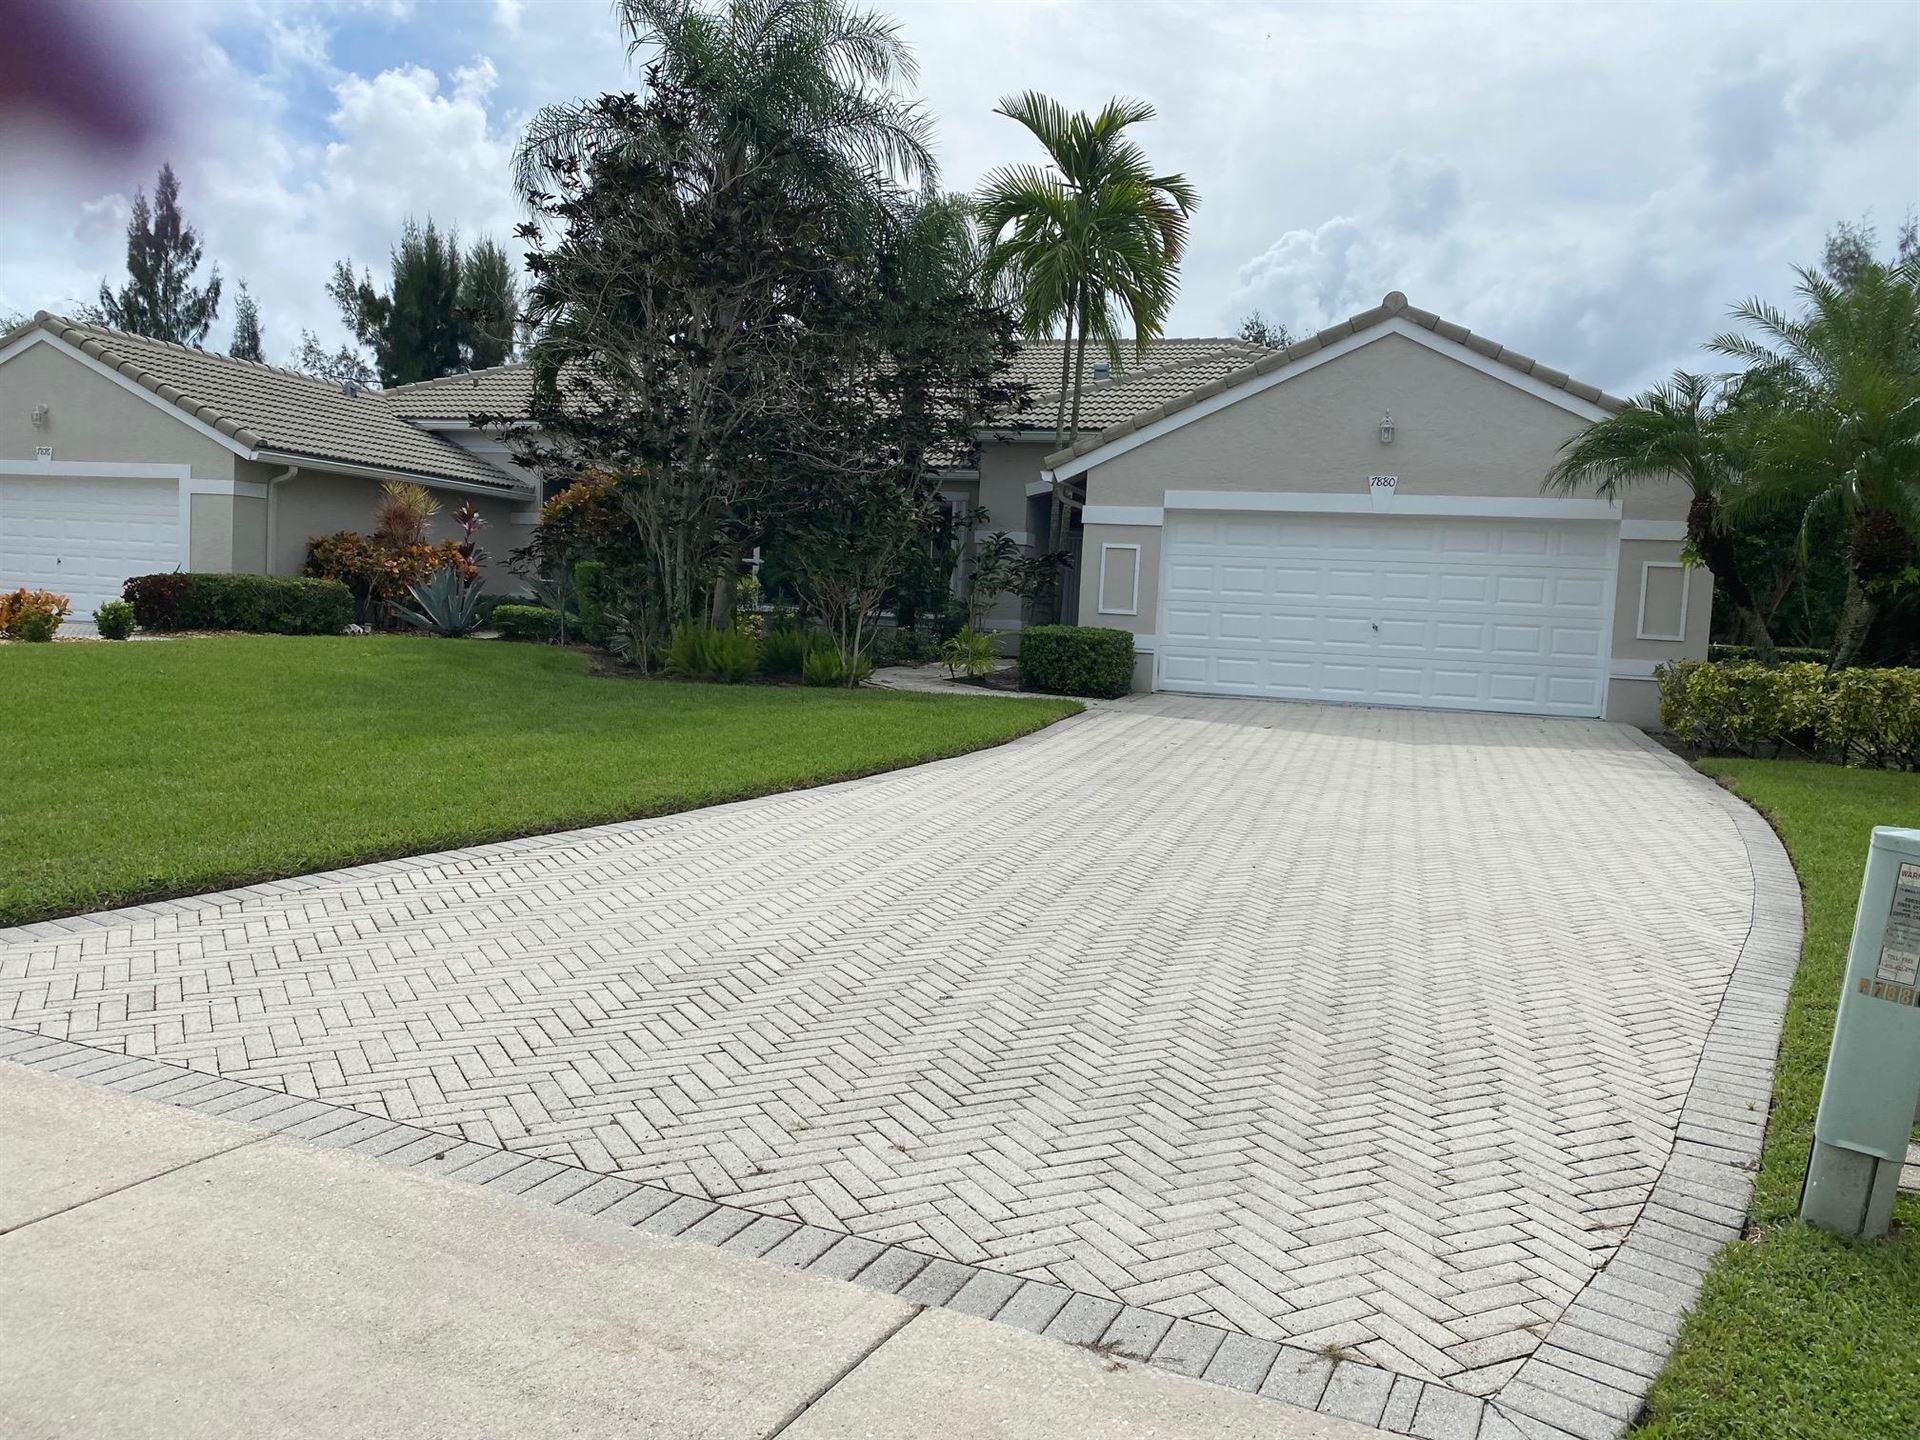 7880 Rockford Road, Boynton Beach, FL 33472 - #: RX-10661048